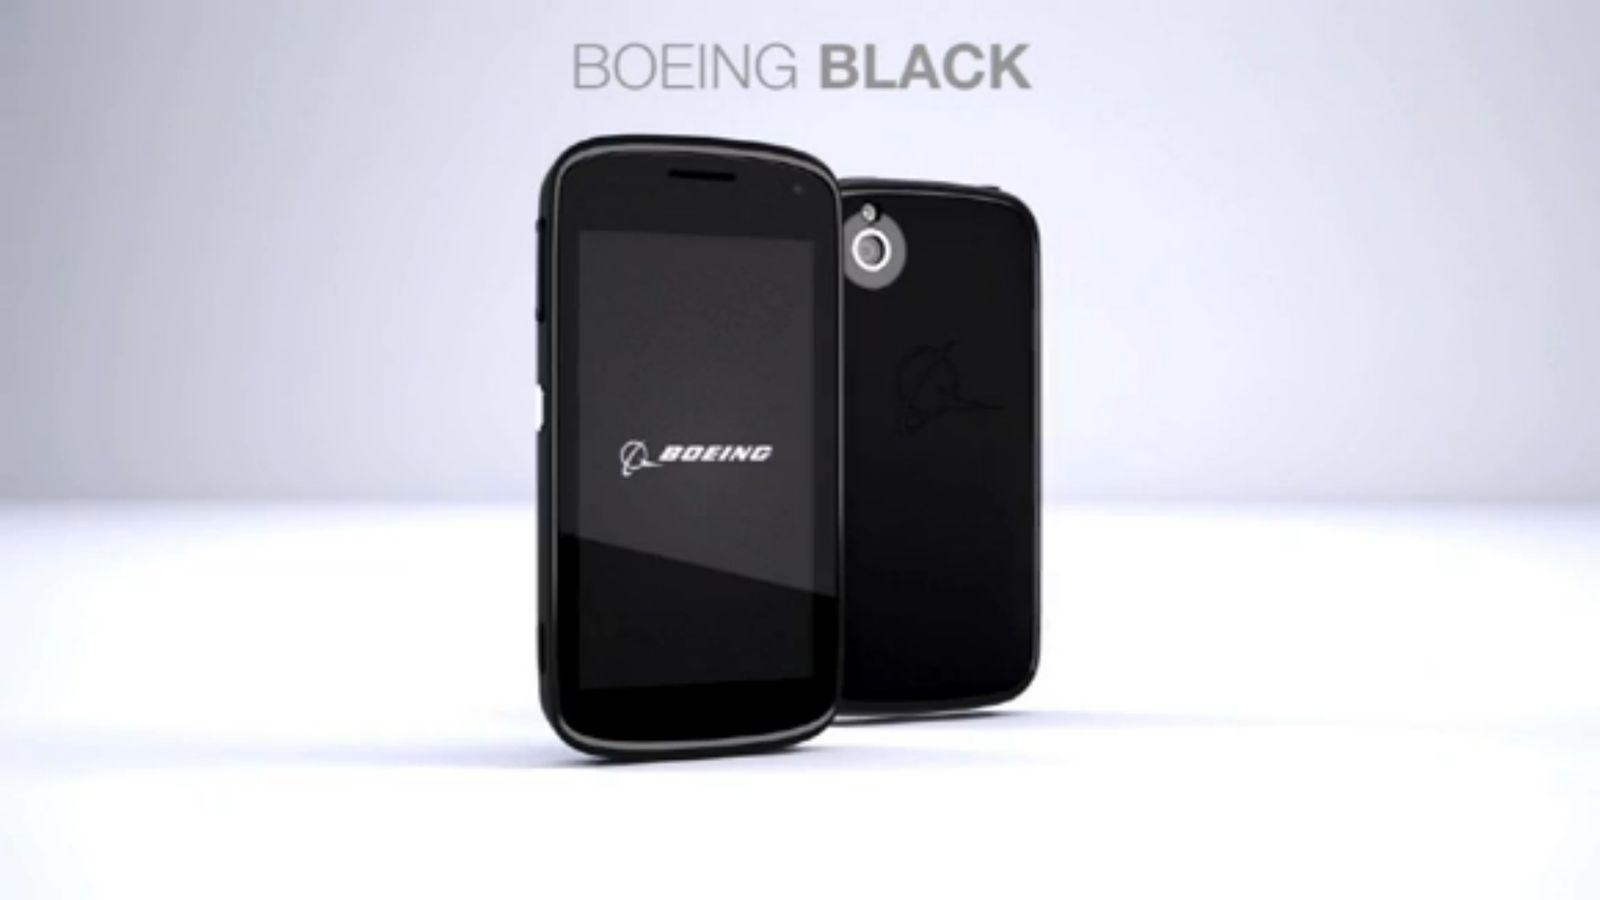 NUR ALS ZITAT Screenshot Boeing Black Smartphone